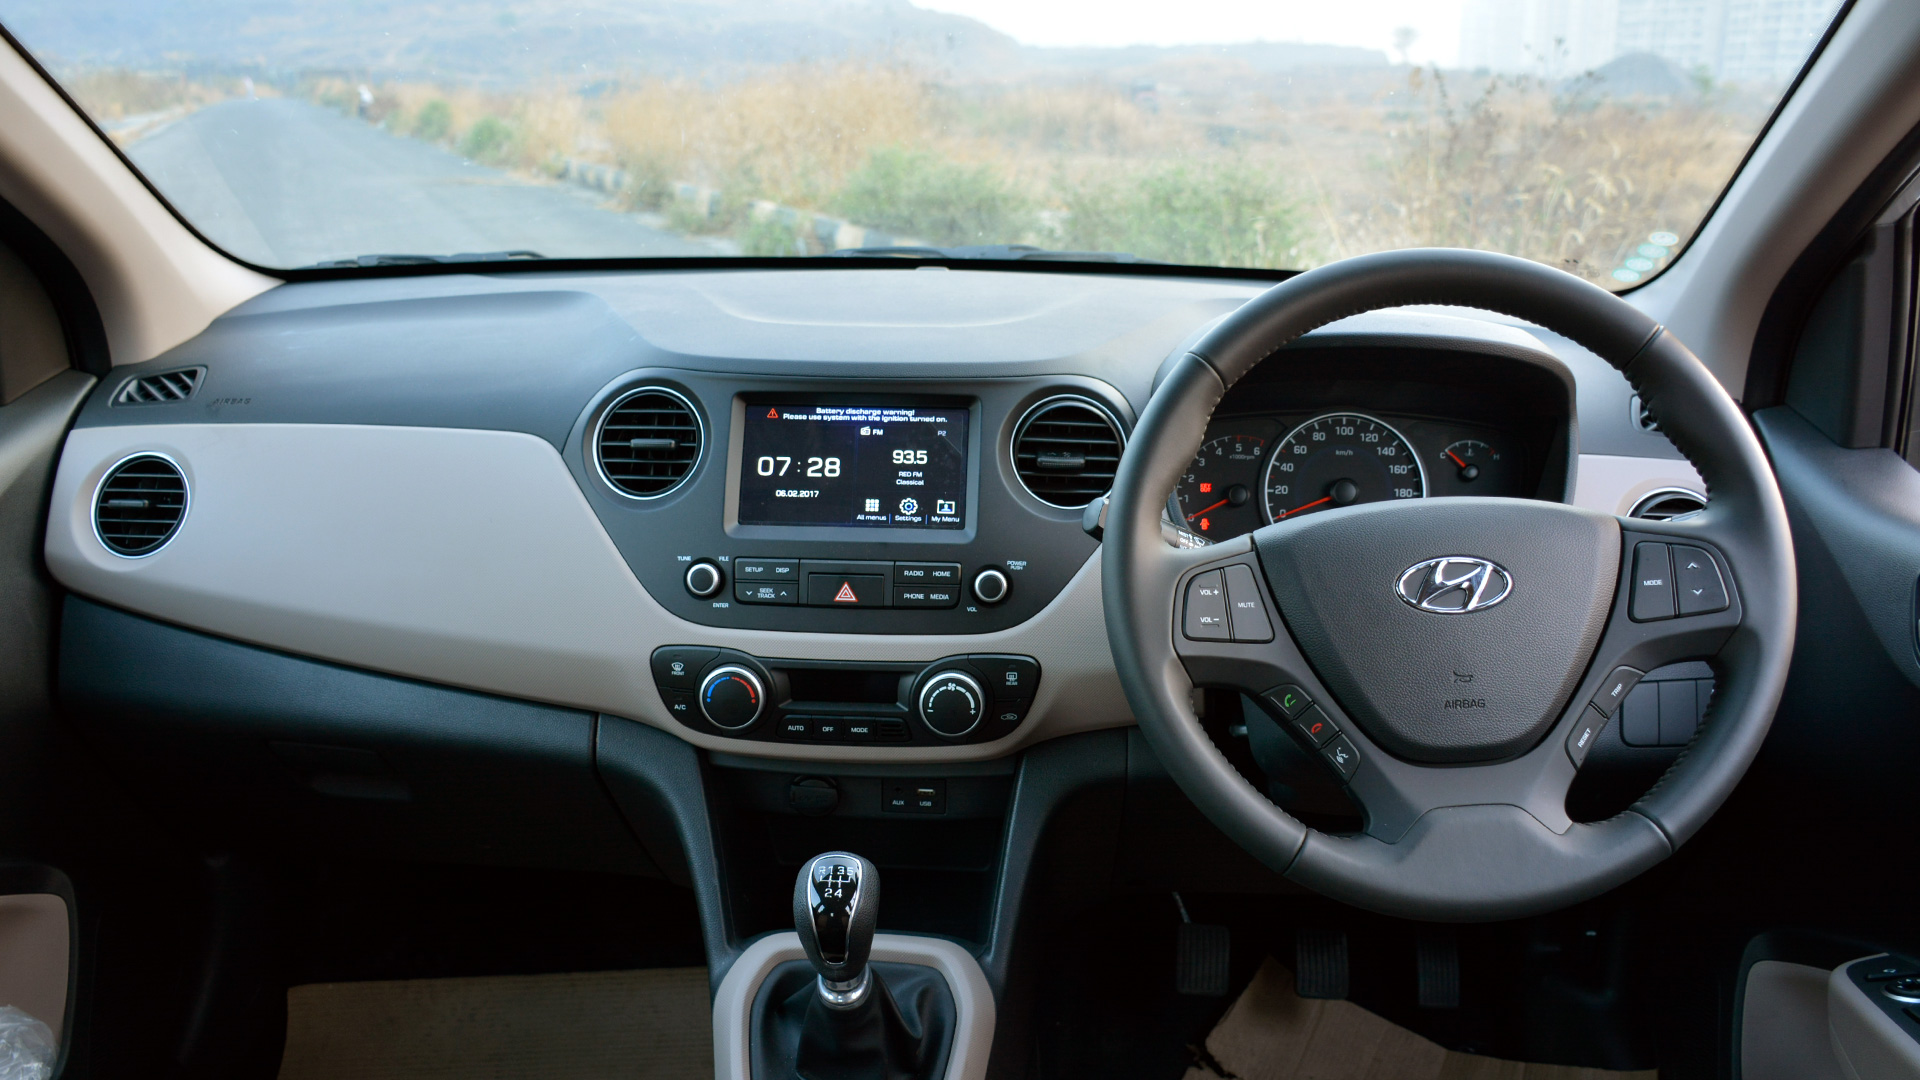 Hyundai Grand i10 2017 Era Petrol - Price, Mileage, Reviews ...